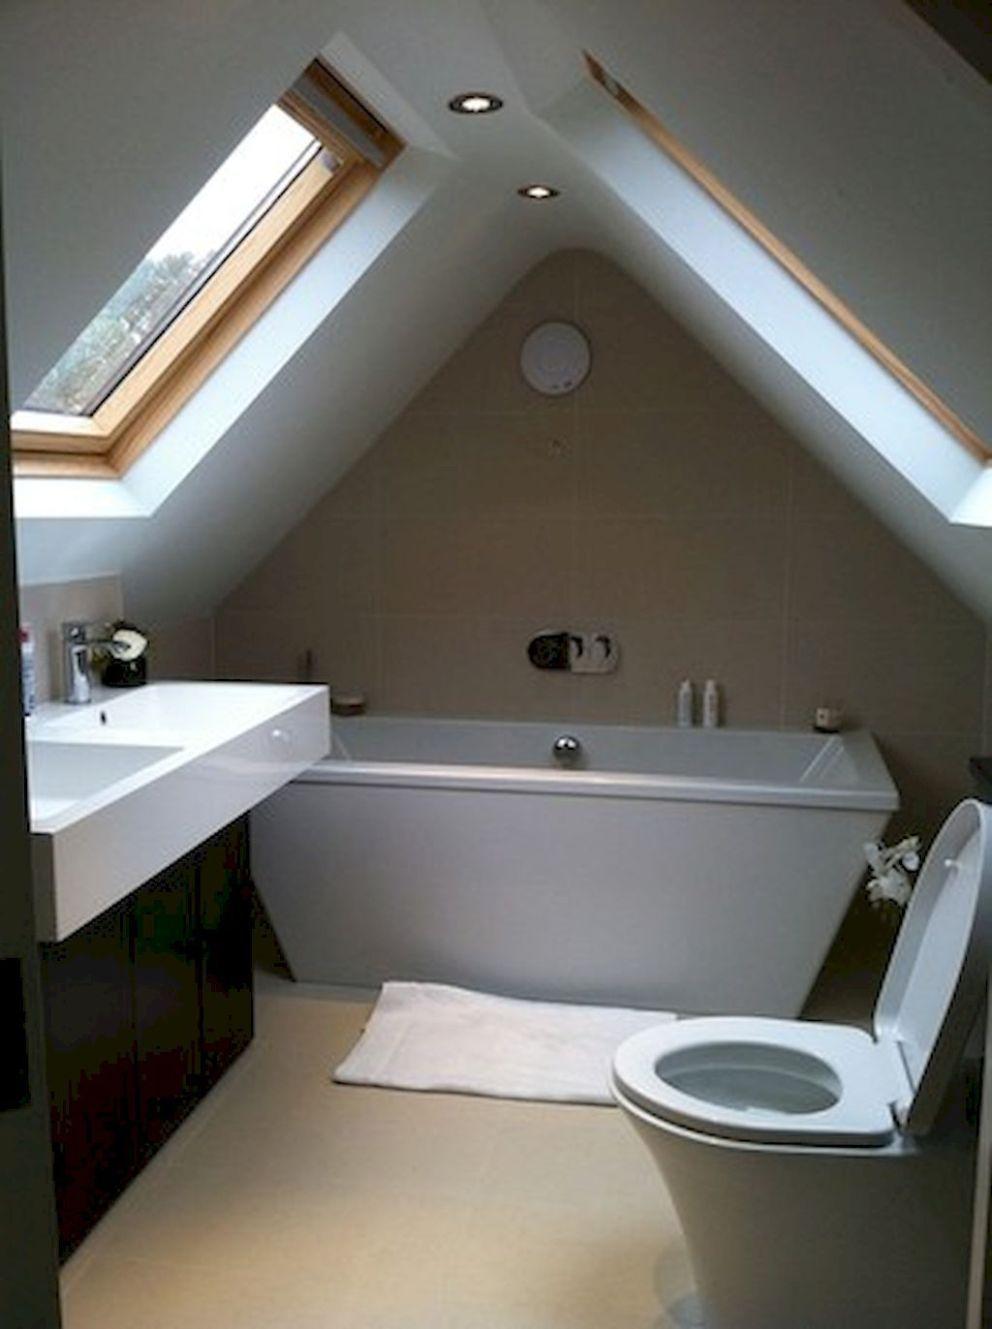 40 creative attic bathroom ideas 5b55efa2a8300 small on home inspirations this year the perfect dream bathrooms diy bathroom ideas id=38959